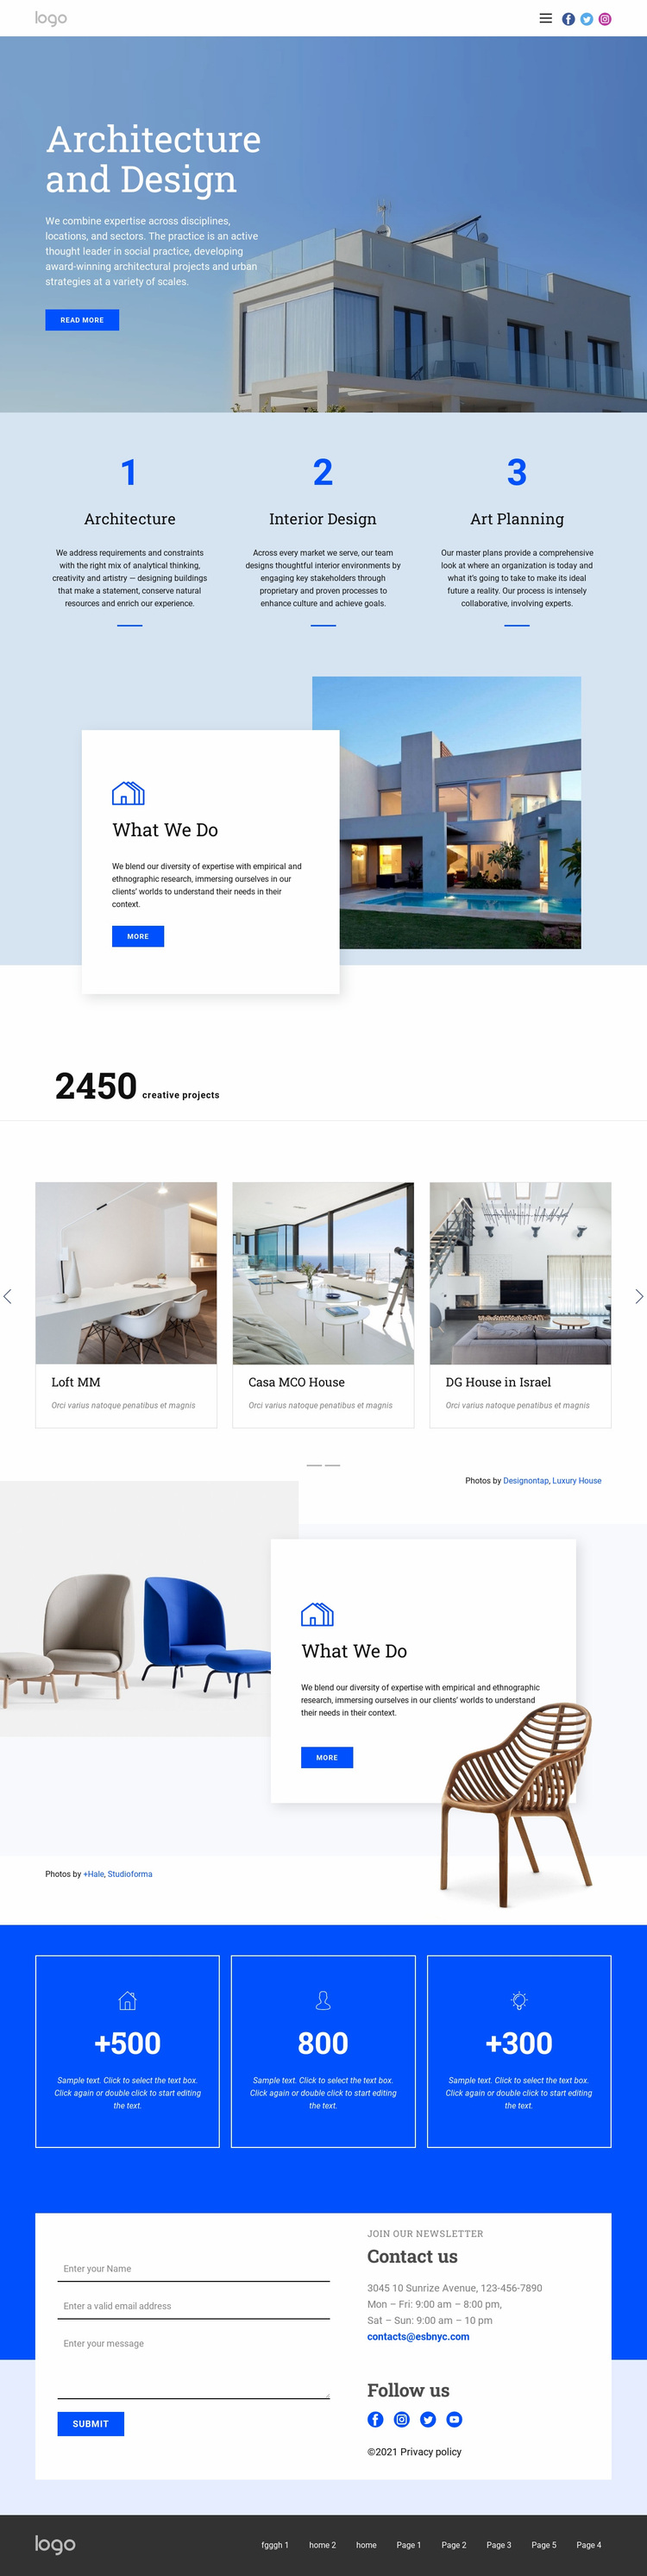 Architecture and design Website Design